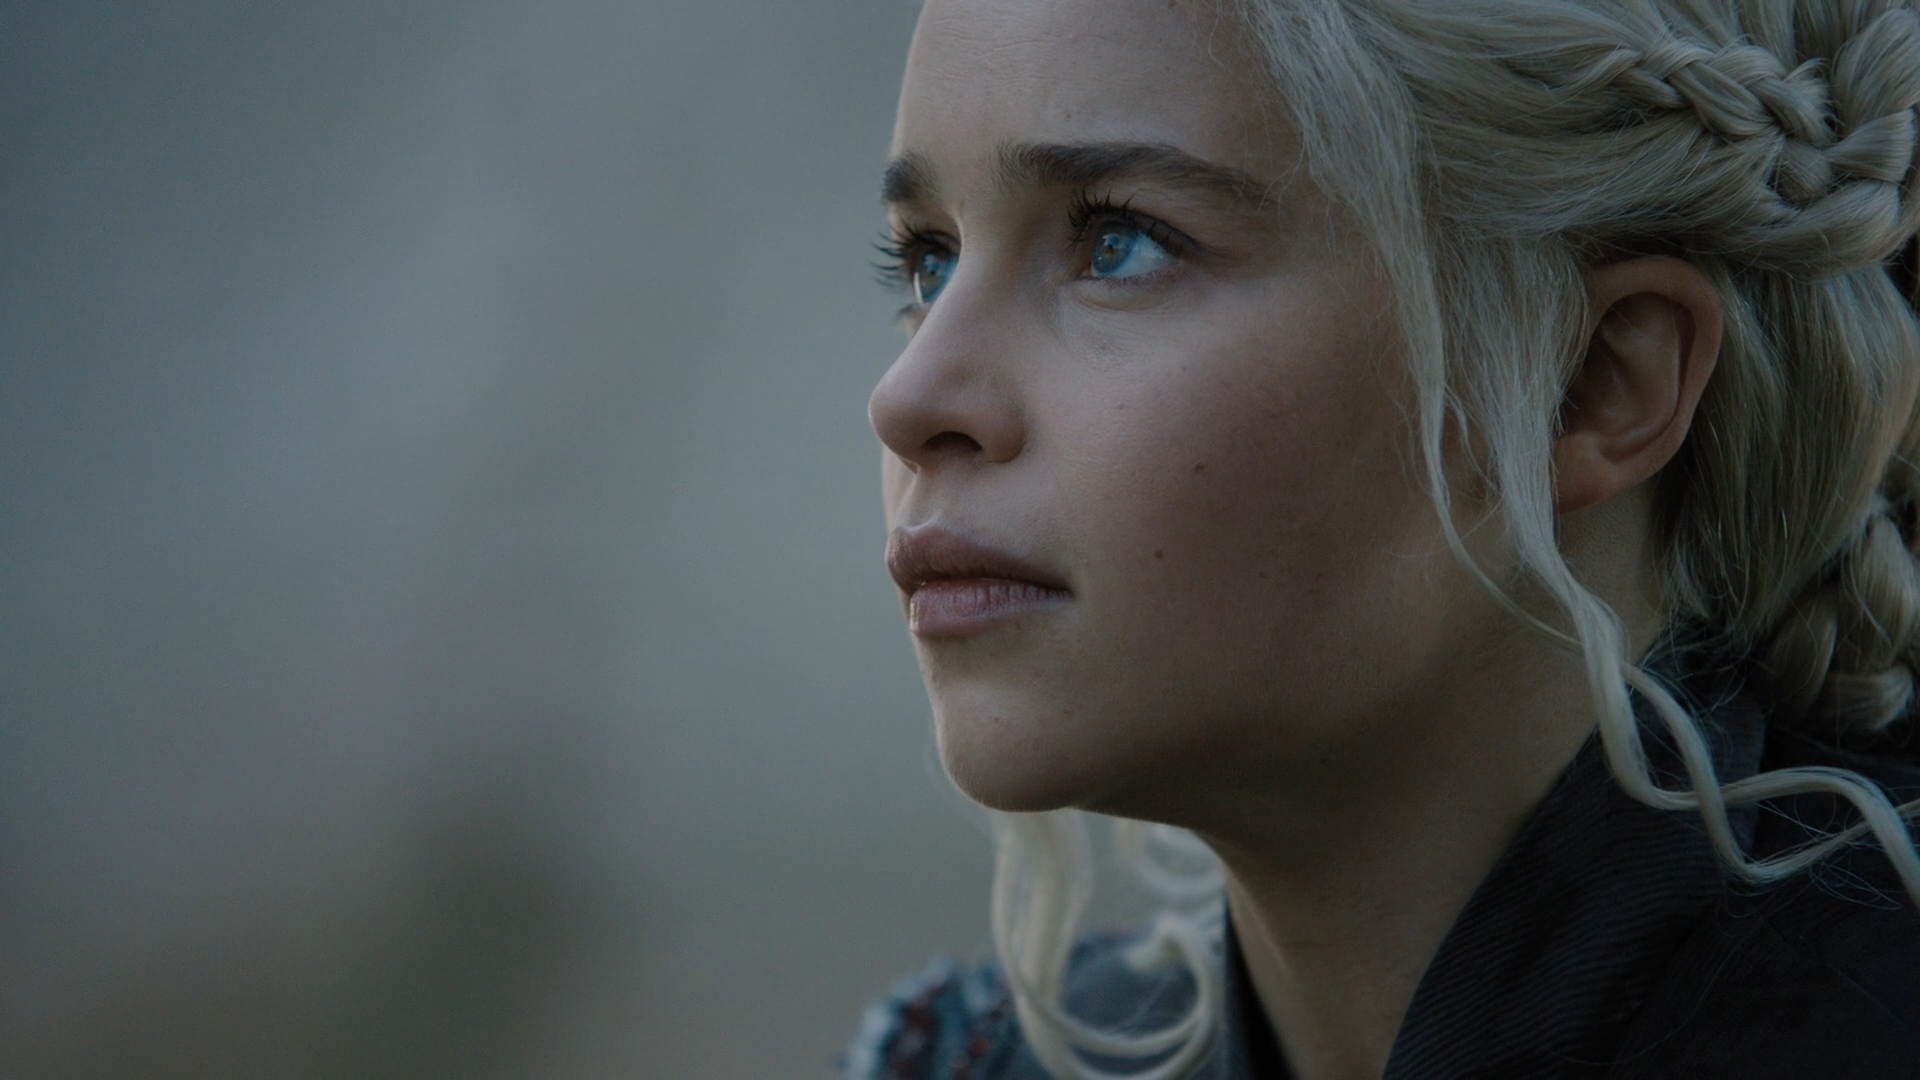 People 1920x1080 Game of Thrones Daenerys Targaryen Emilia Clarke